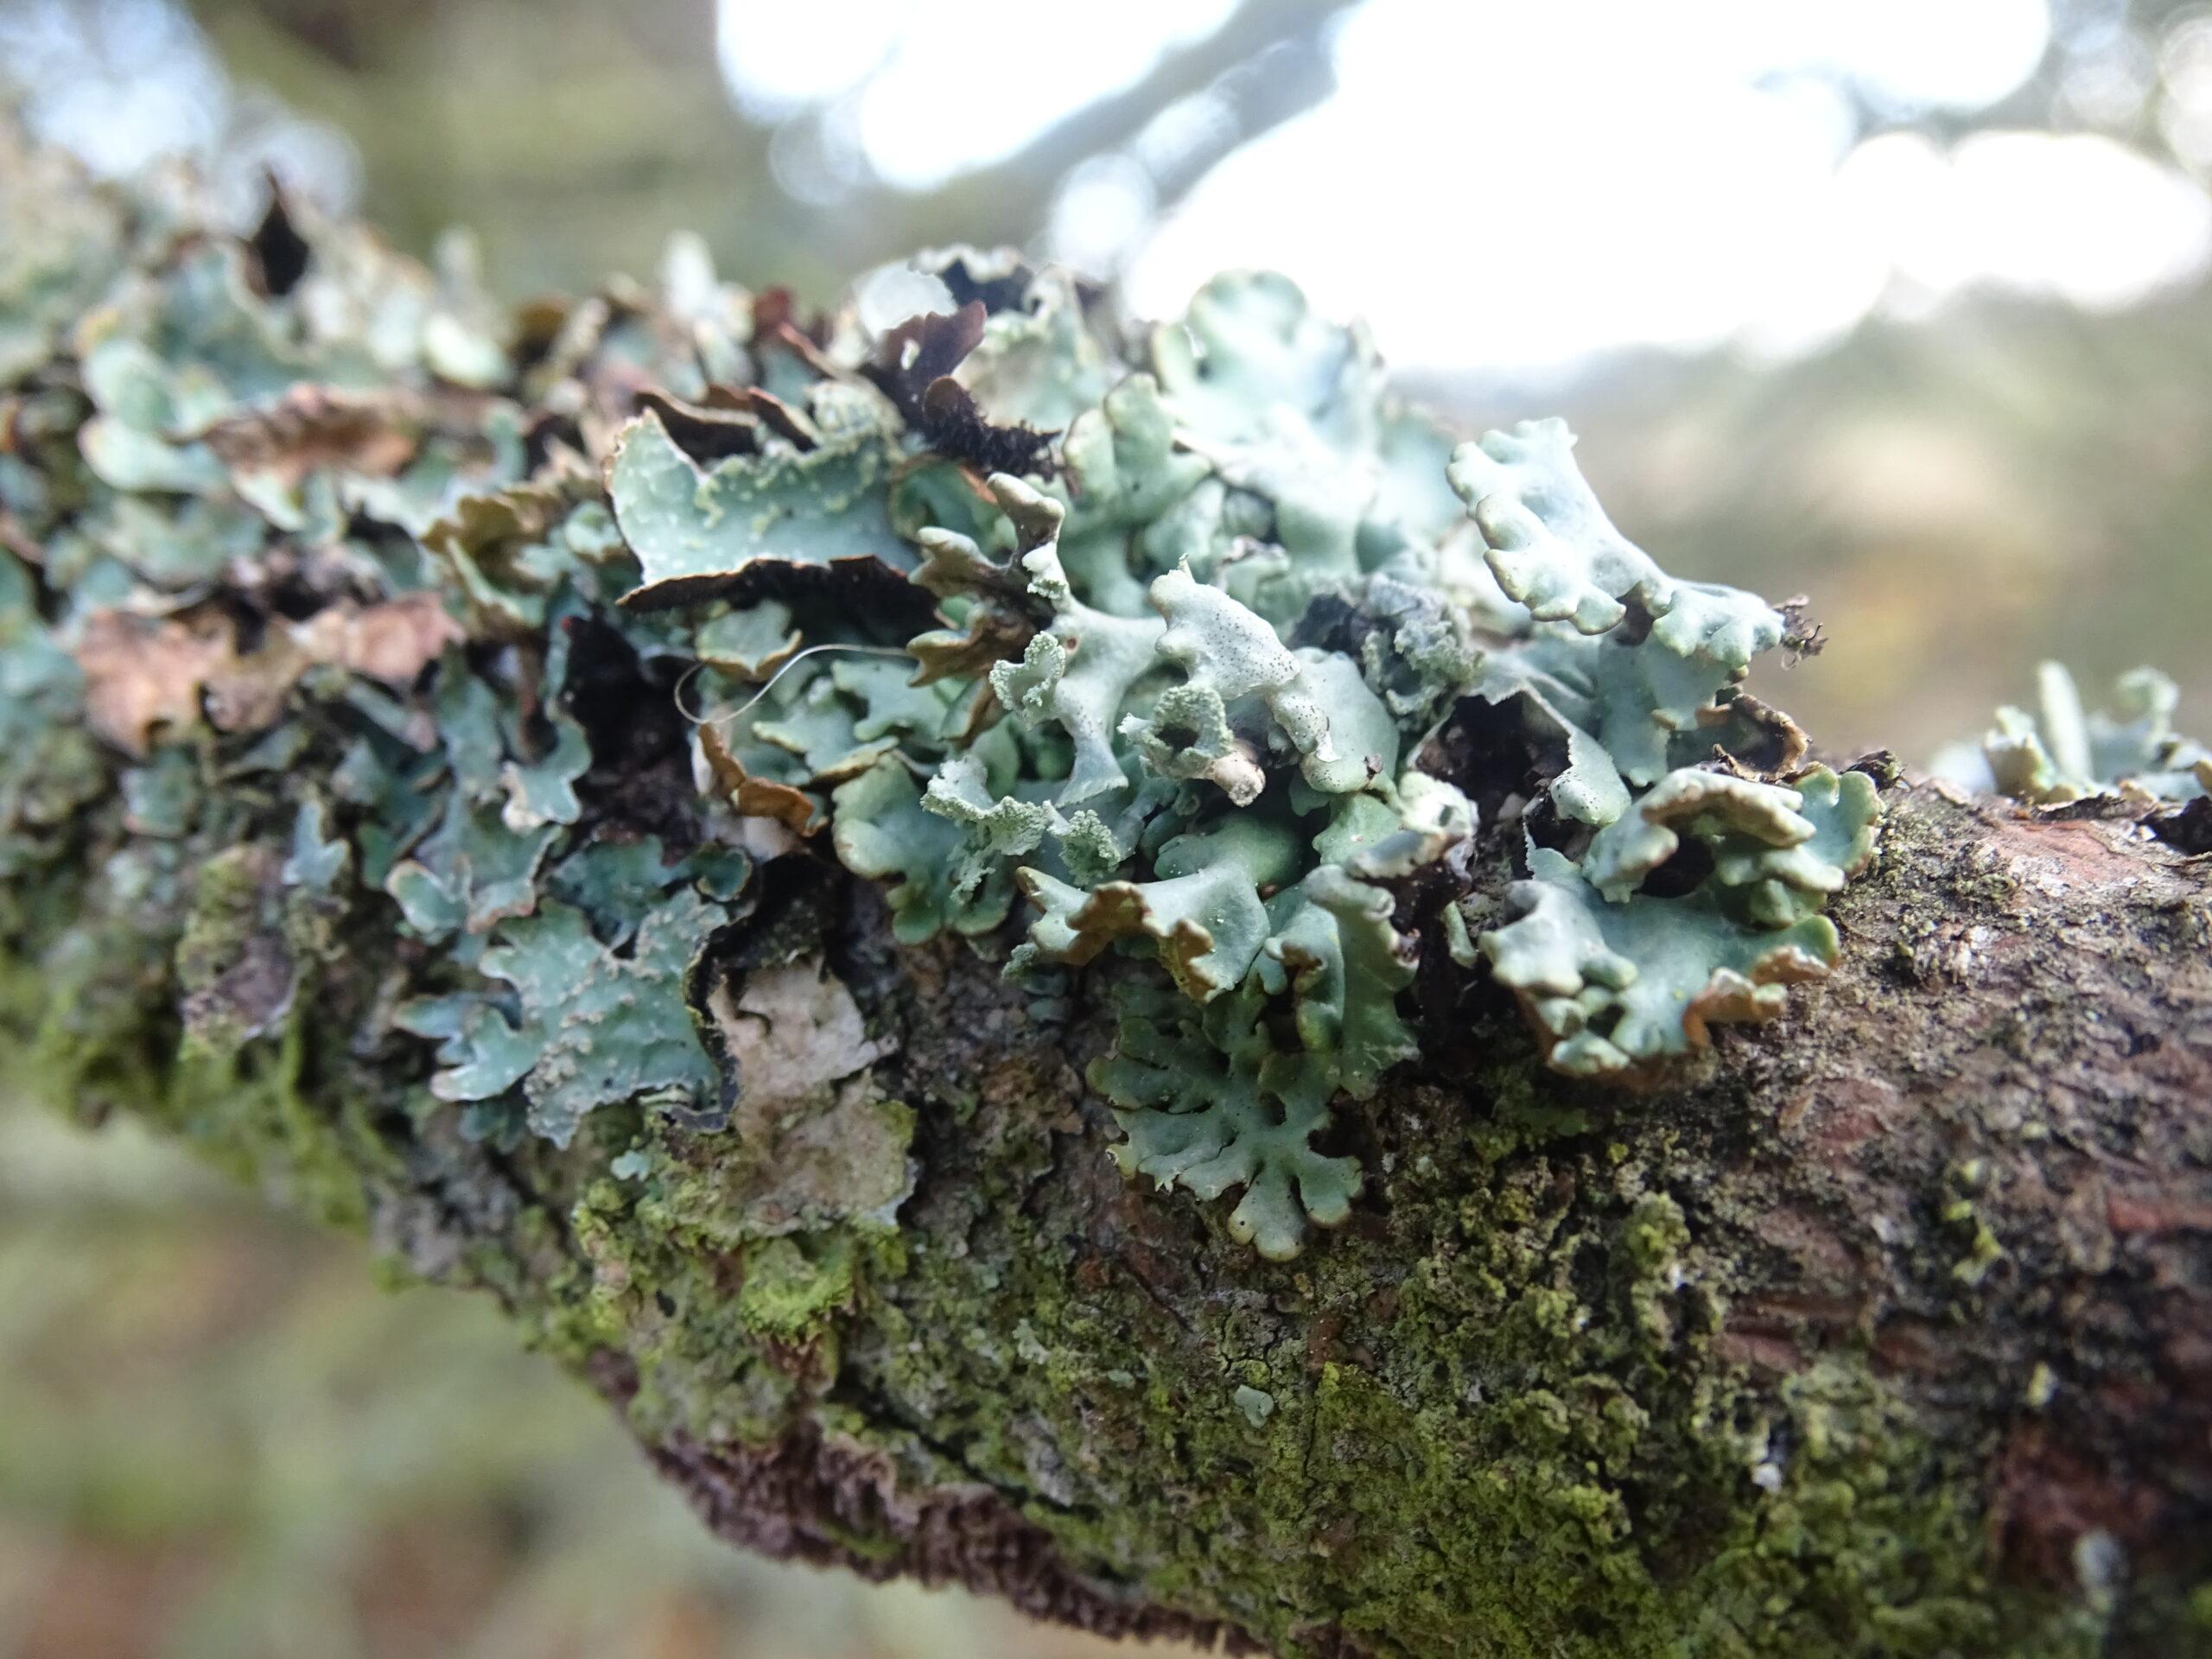 color shot of leafy lichen in blue-grey